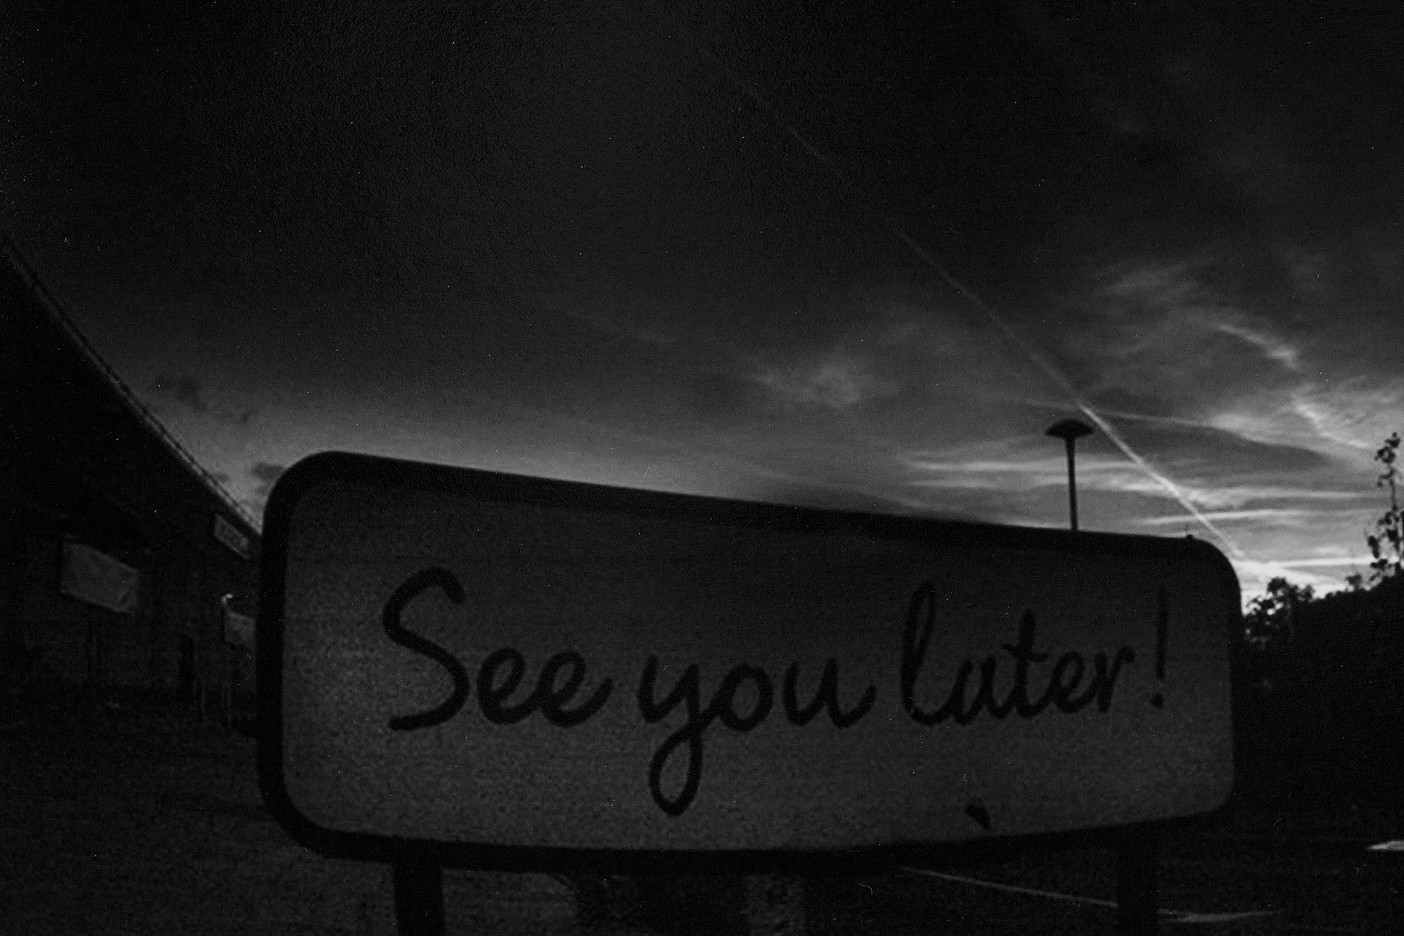 I still prefer see you soon